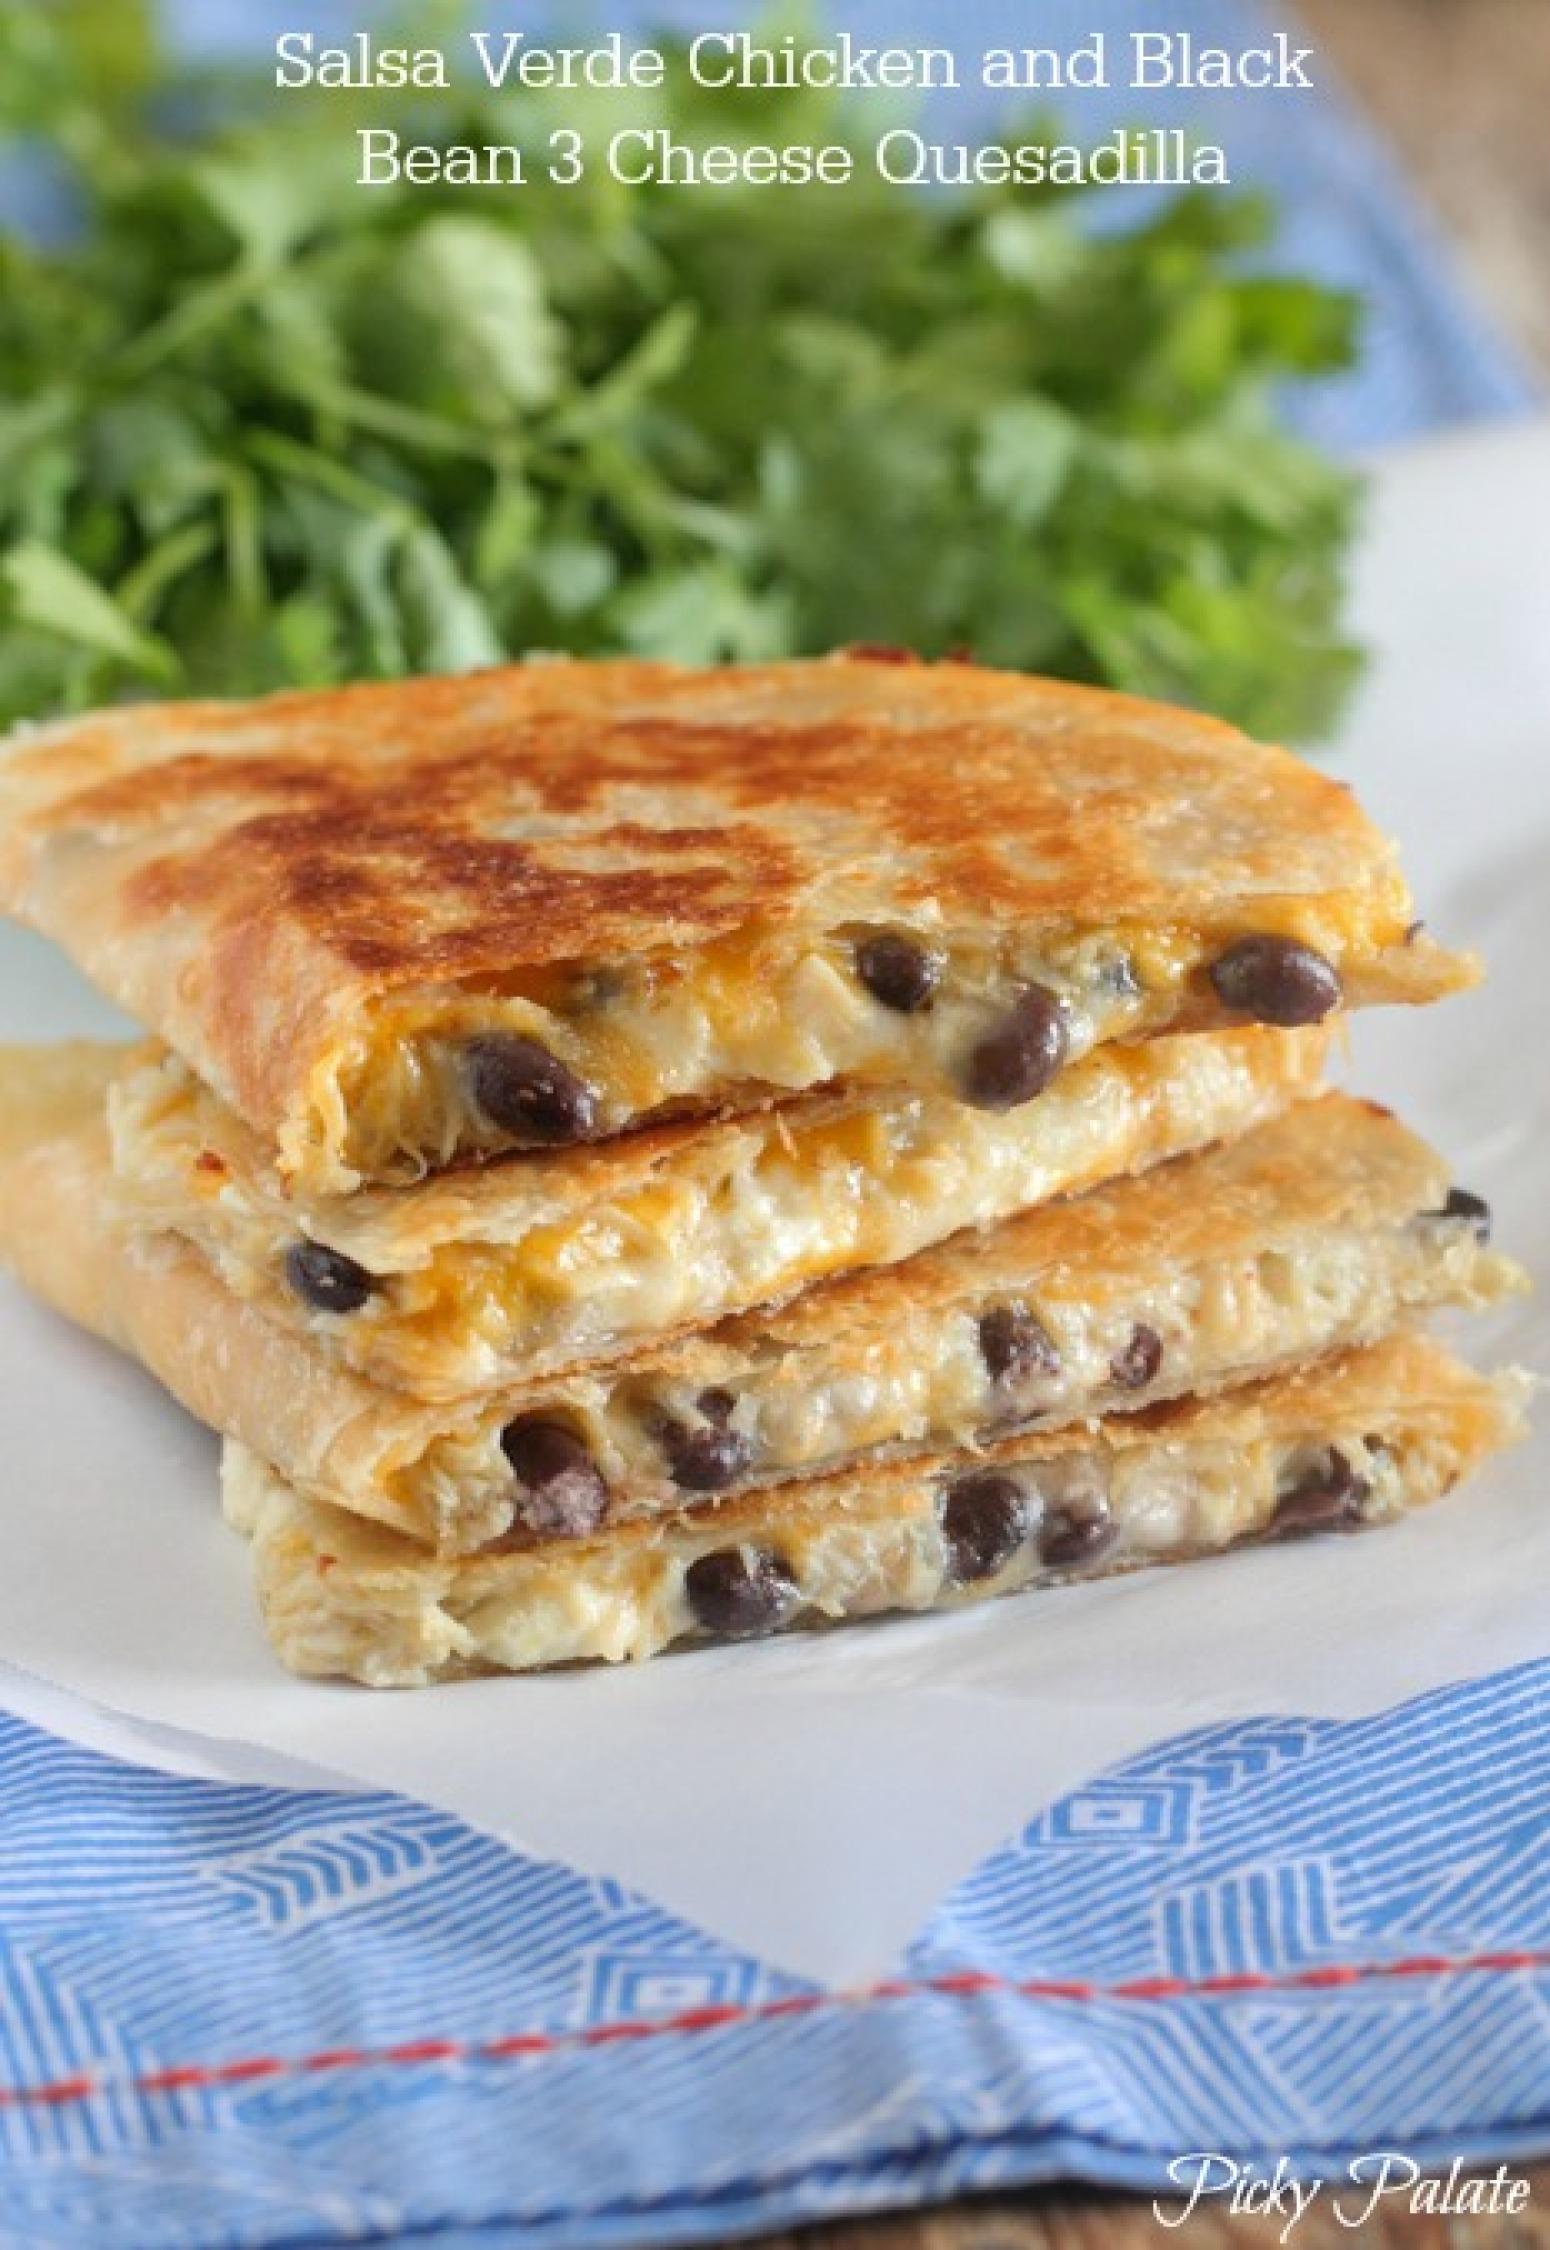 Salsa Verde Chicken and Black Bean 3 Cheese Quesadilla Recipe 3 | Just ...